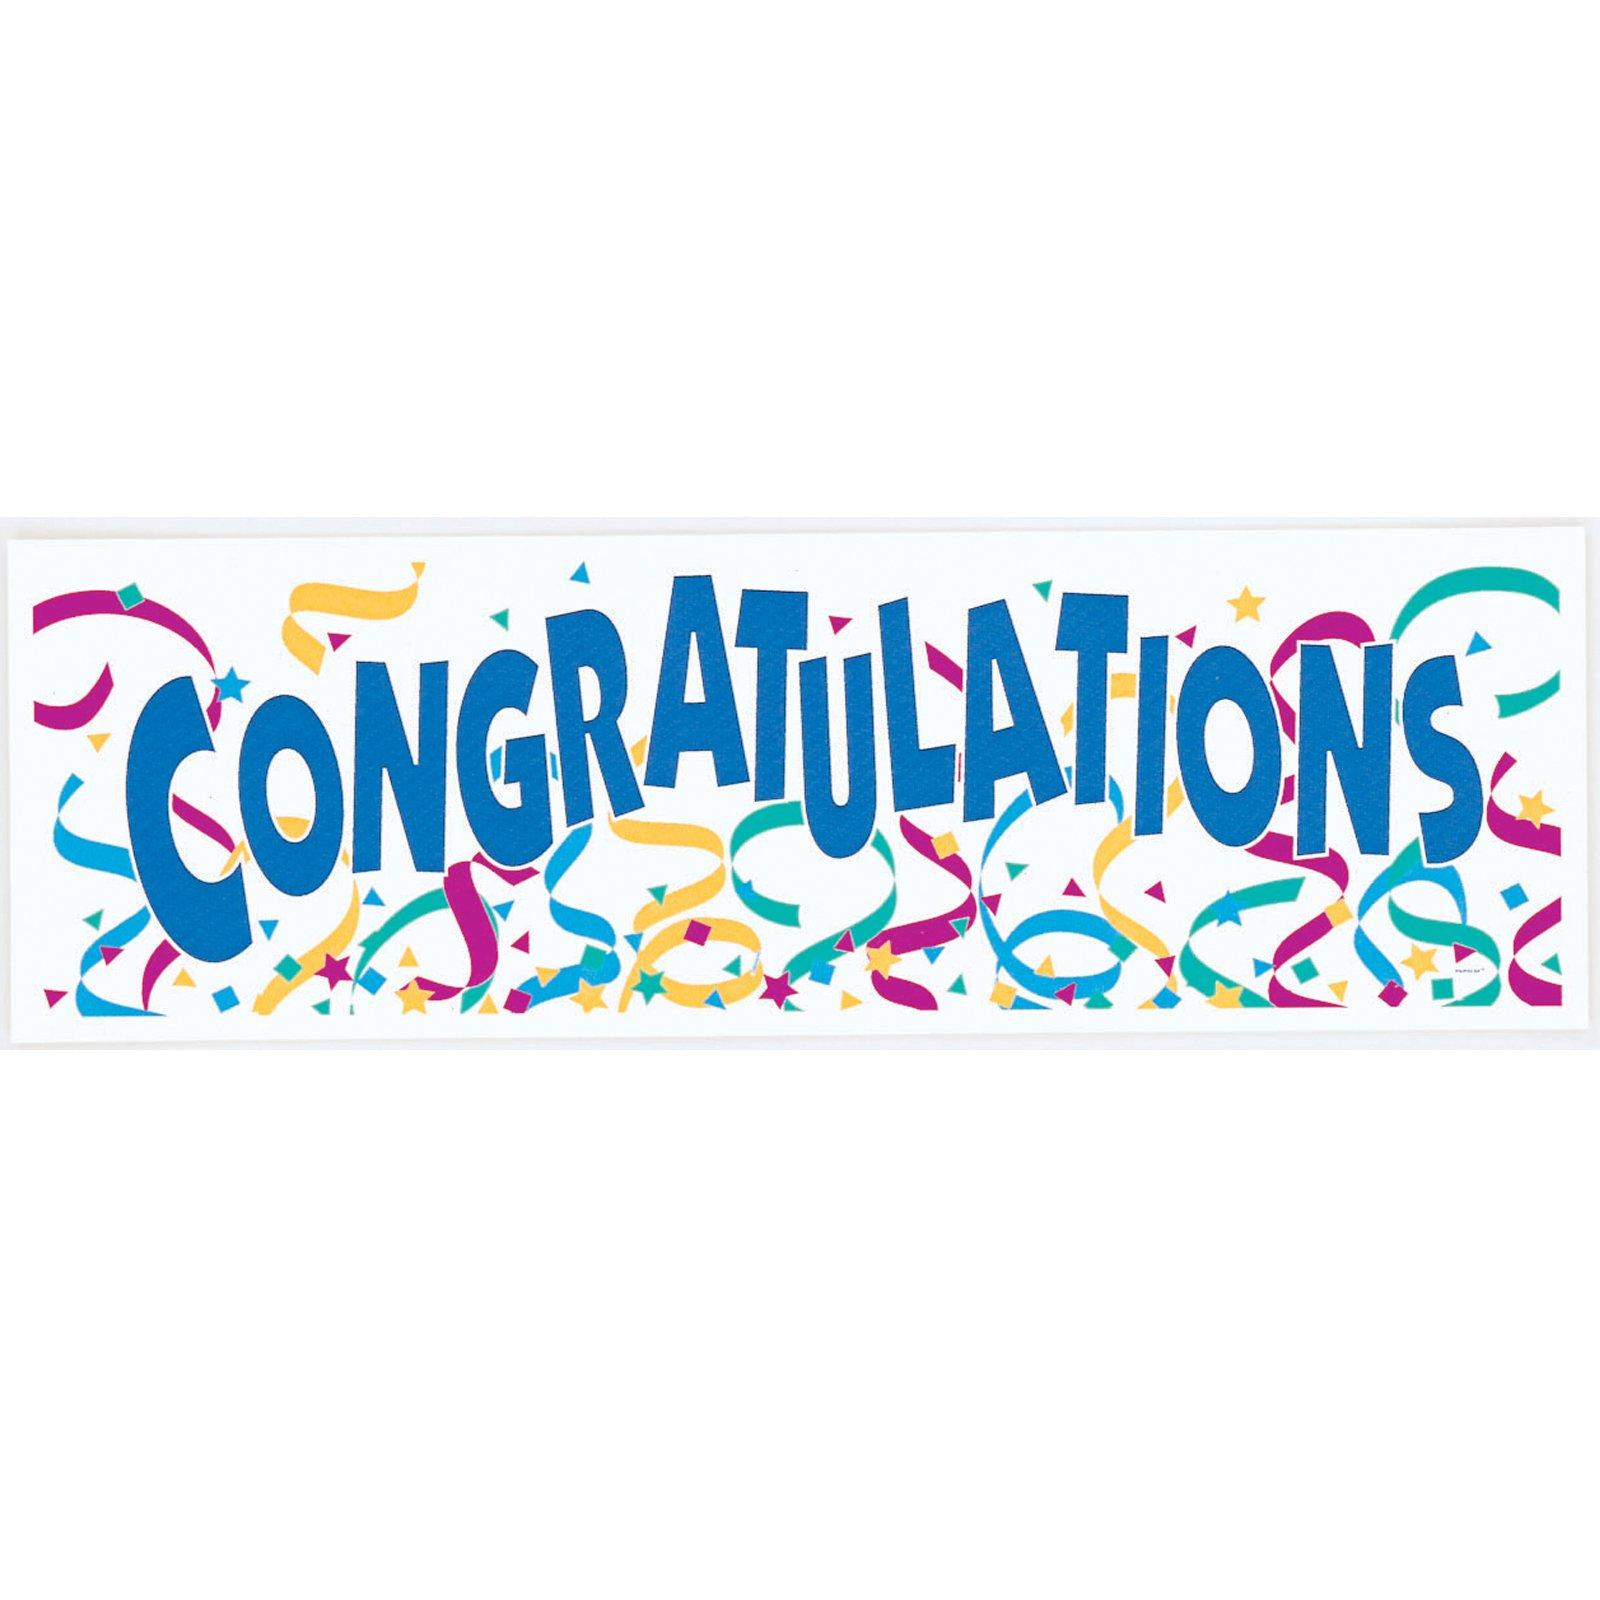 Congratulations clipart blue. Free cliparts download clip